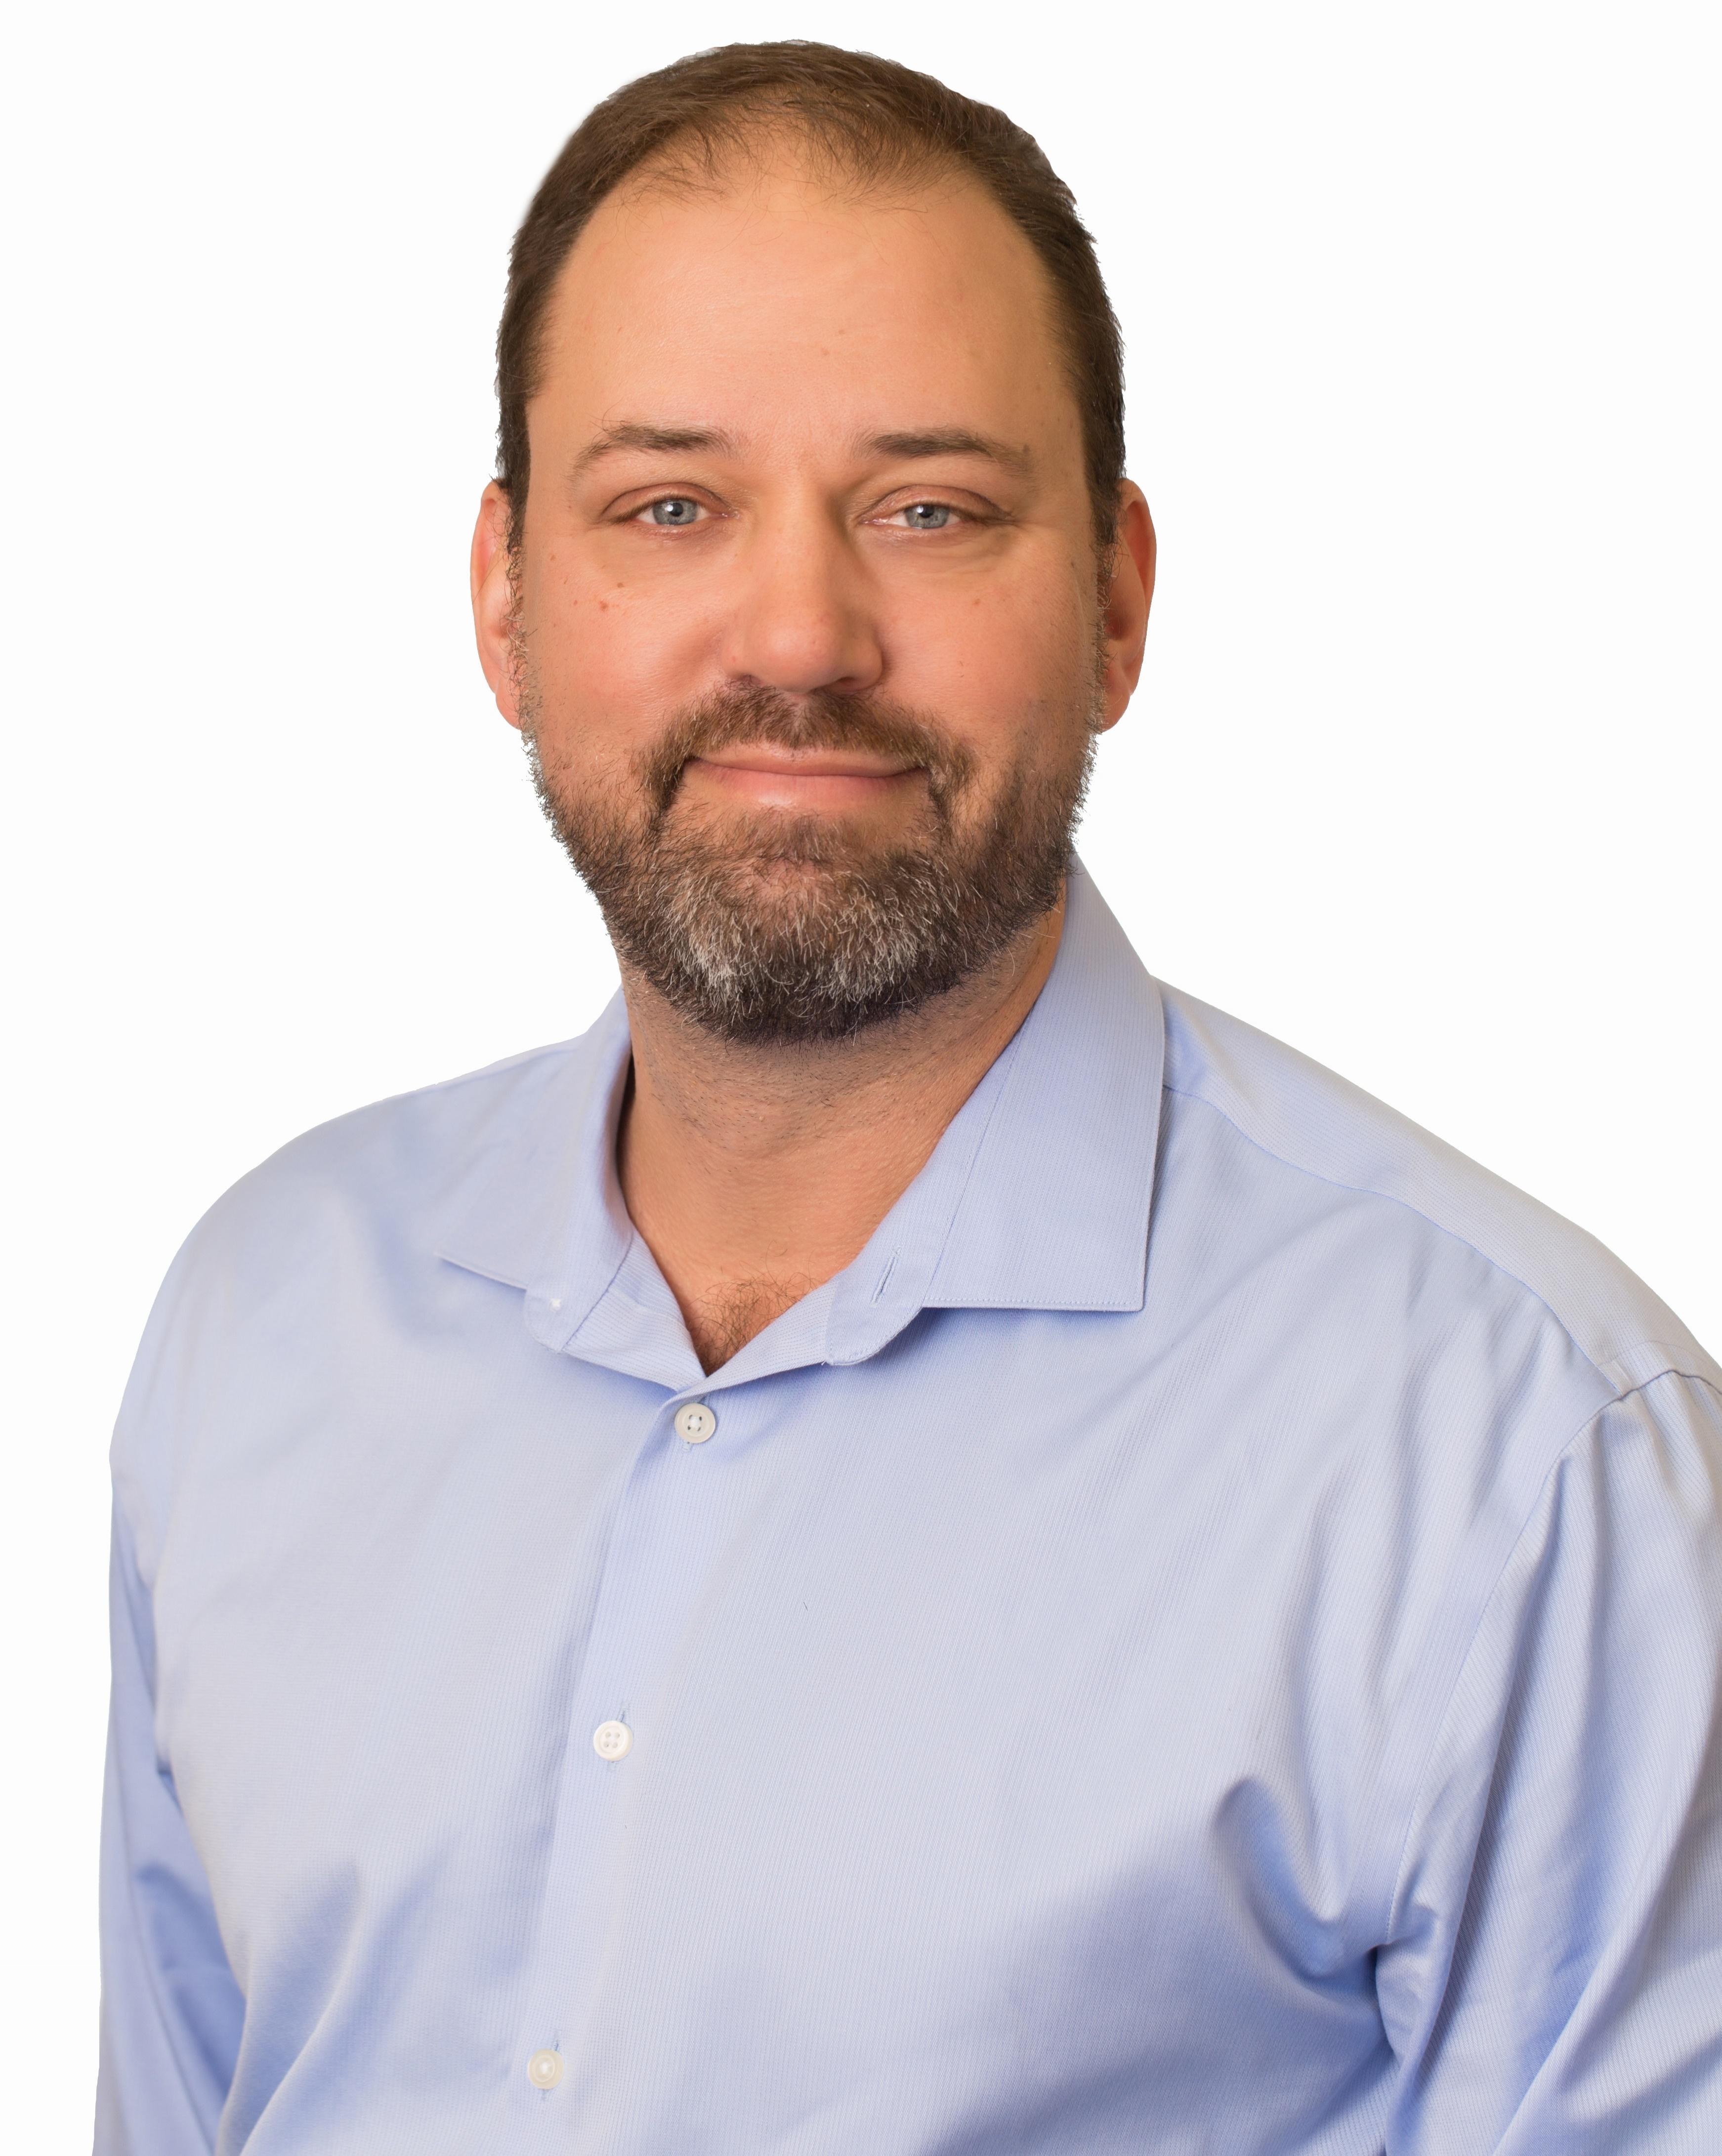 Dr. John Martinez